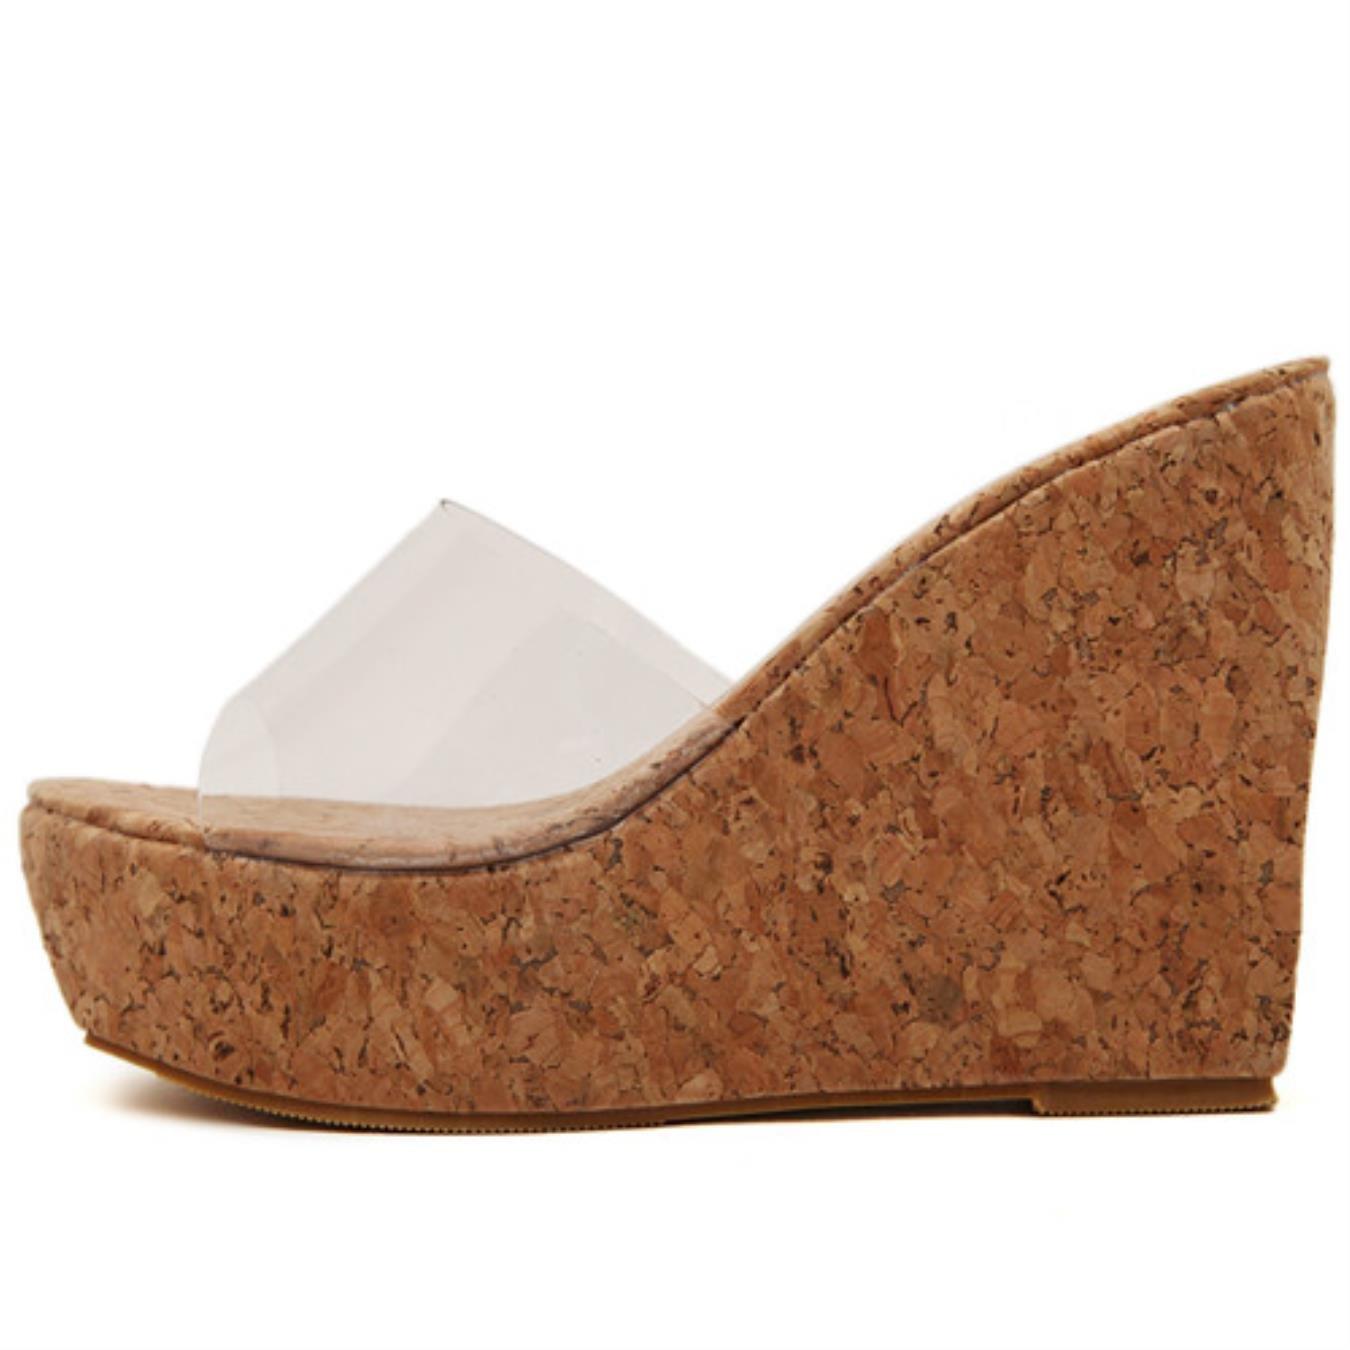 Gdgydh New Summer Transparent Platform Wedges Sandals Women Fashion